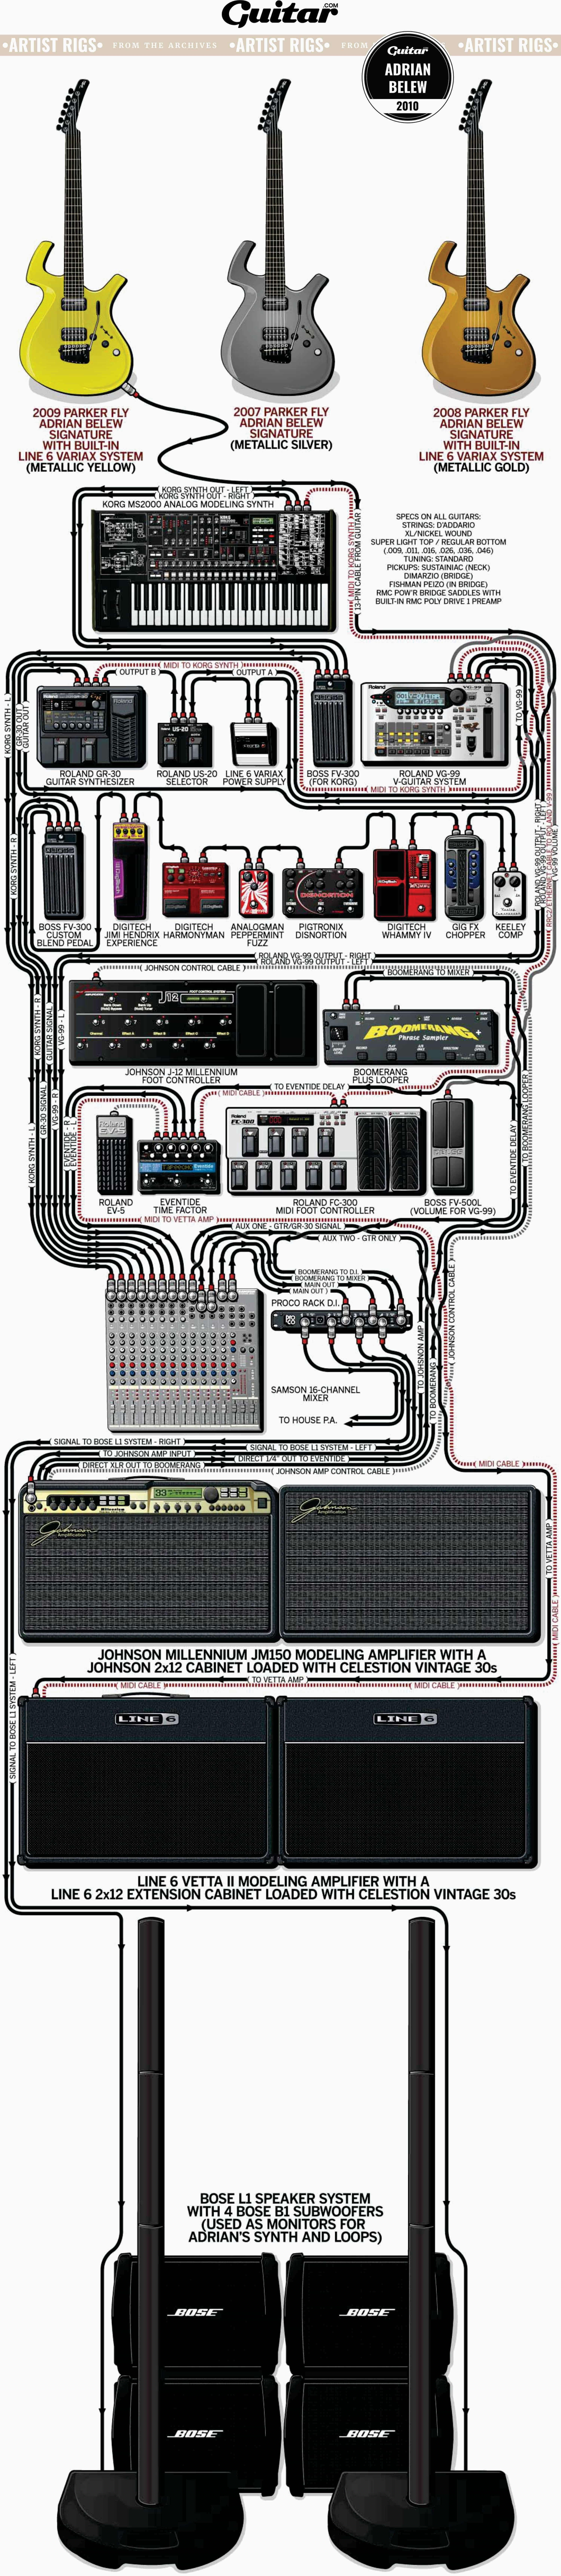 Rig Diagram: Adrian Belew (2010)